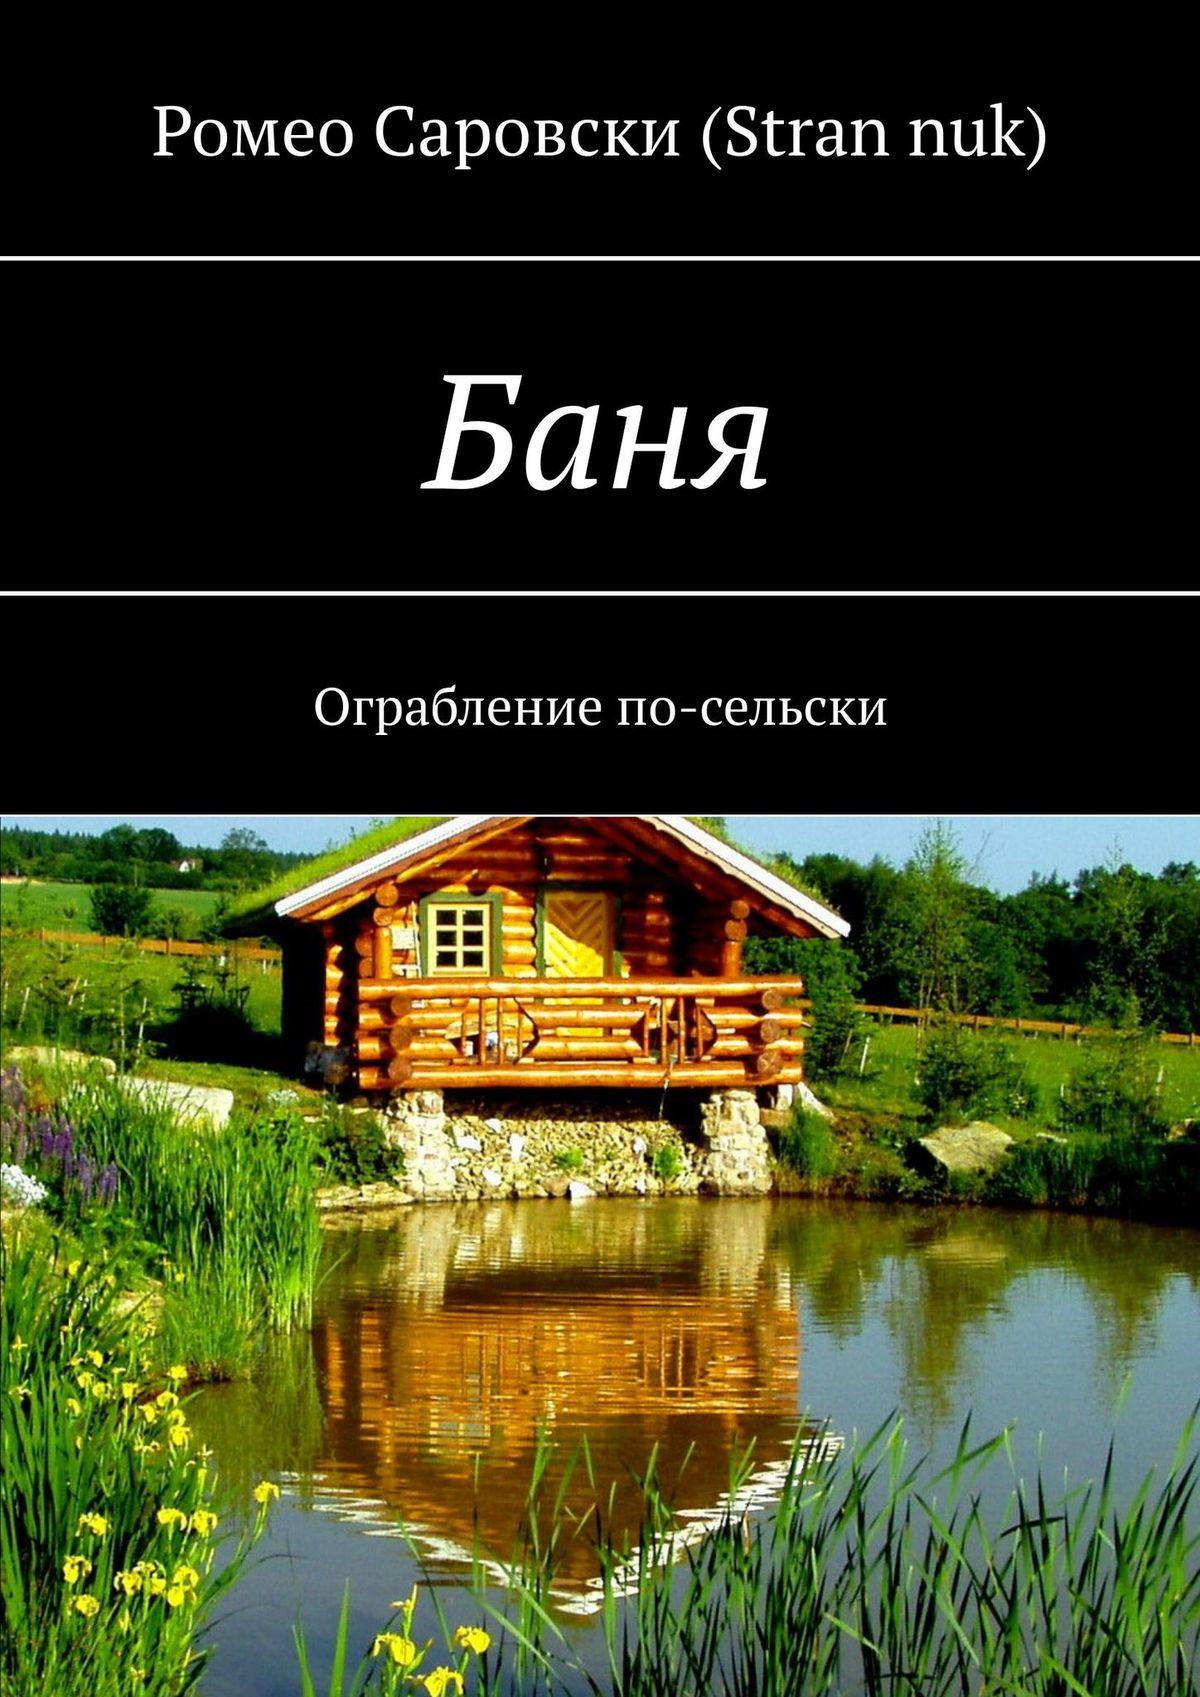 Ромео Саровски (Strannuk) Чемодан. Баня. Крыша ромео саровски stran